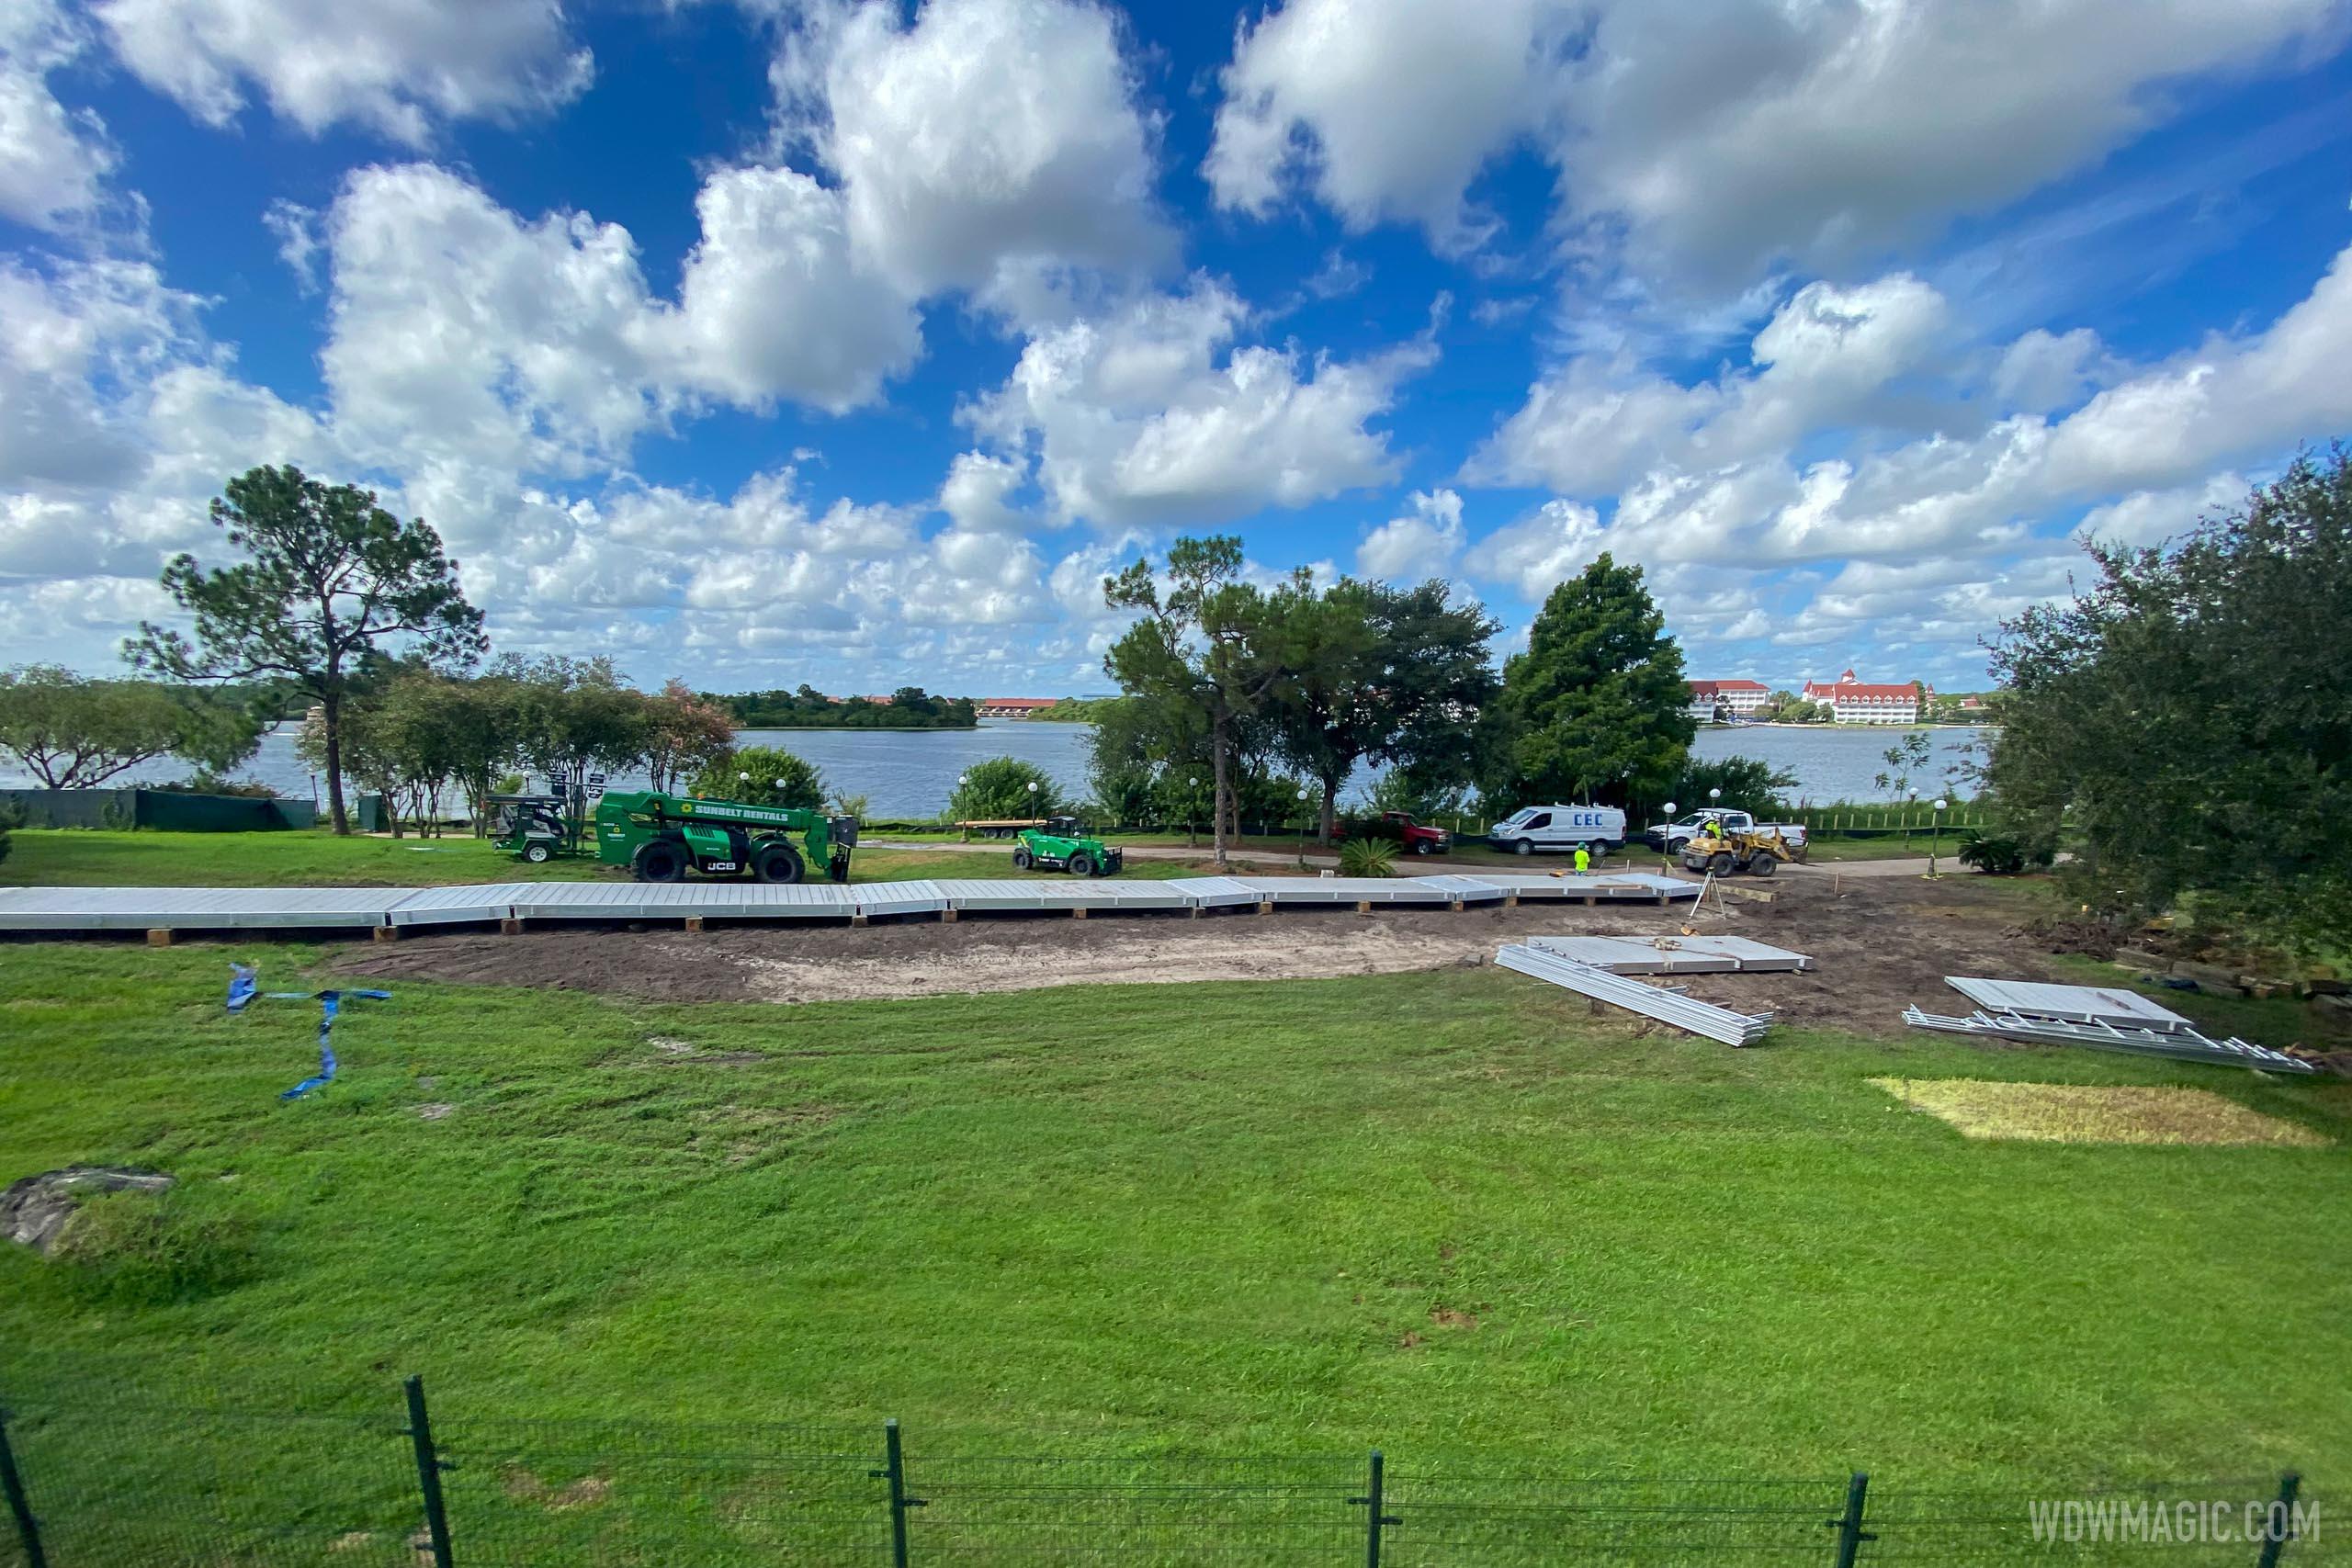 Grand Floridian to Magic Kingdom bridge construction - July 21 2020